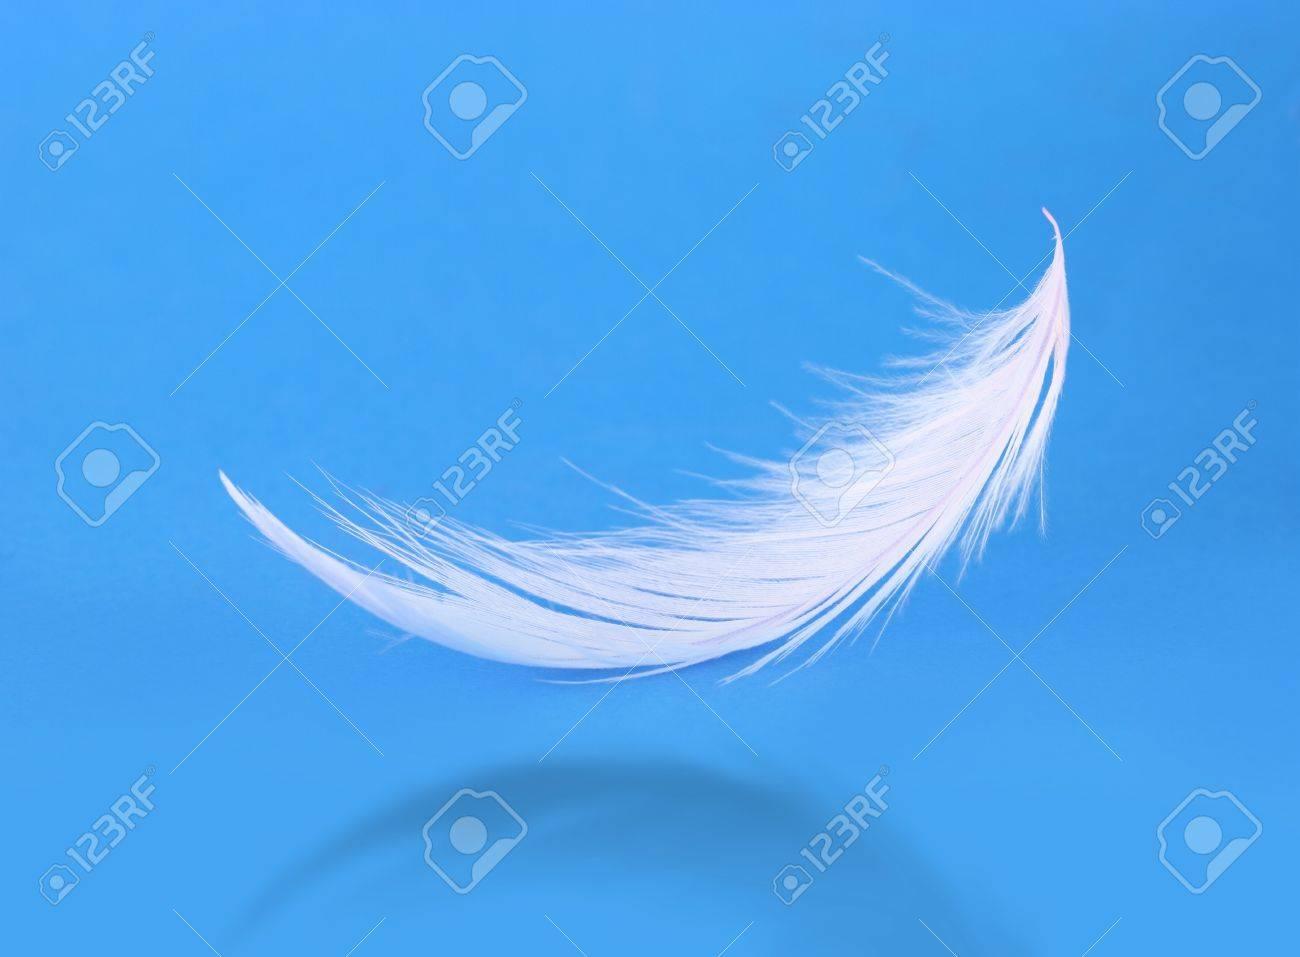 Flying white feather on blue background Stock Photo - 19129246